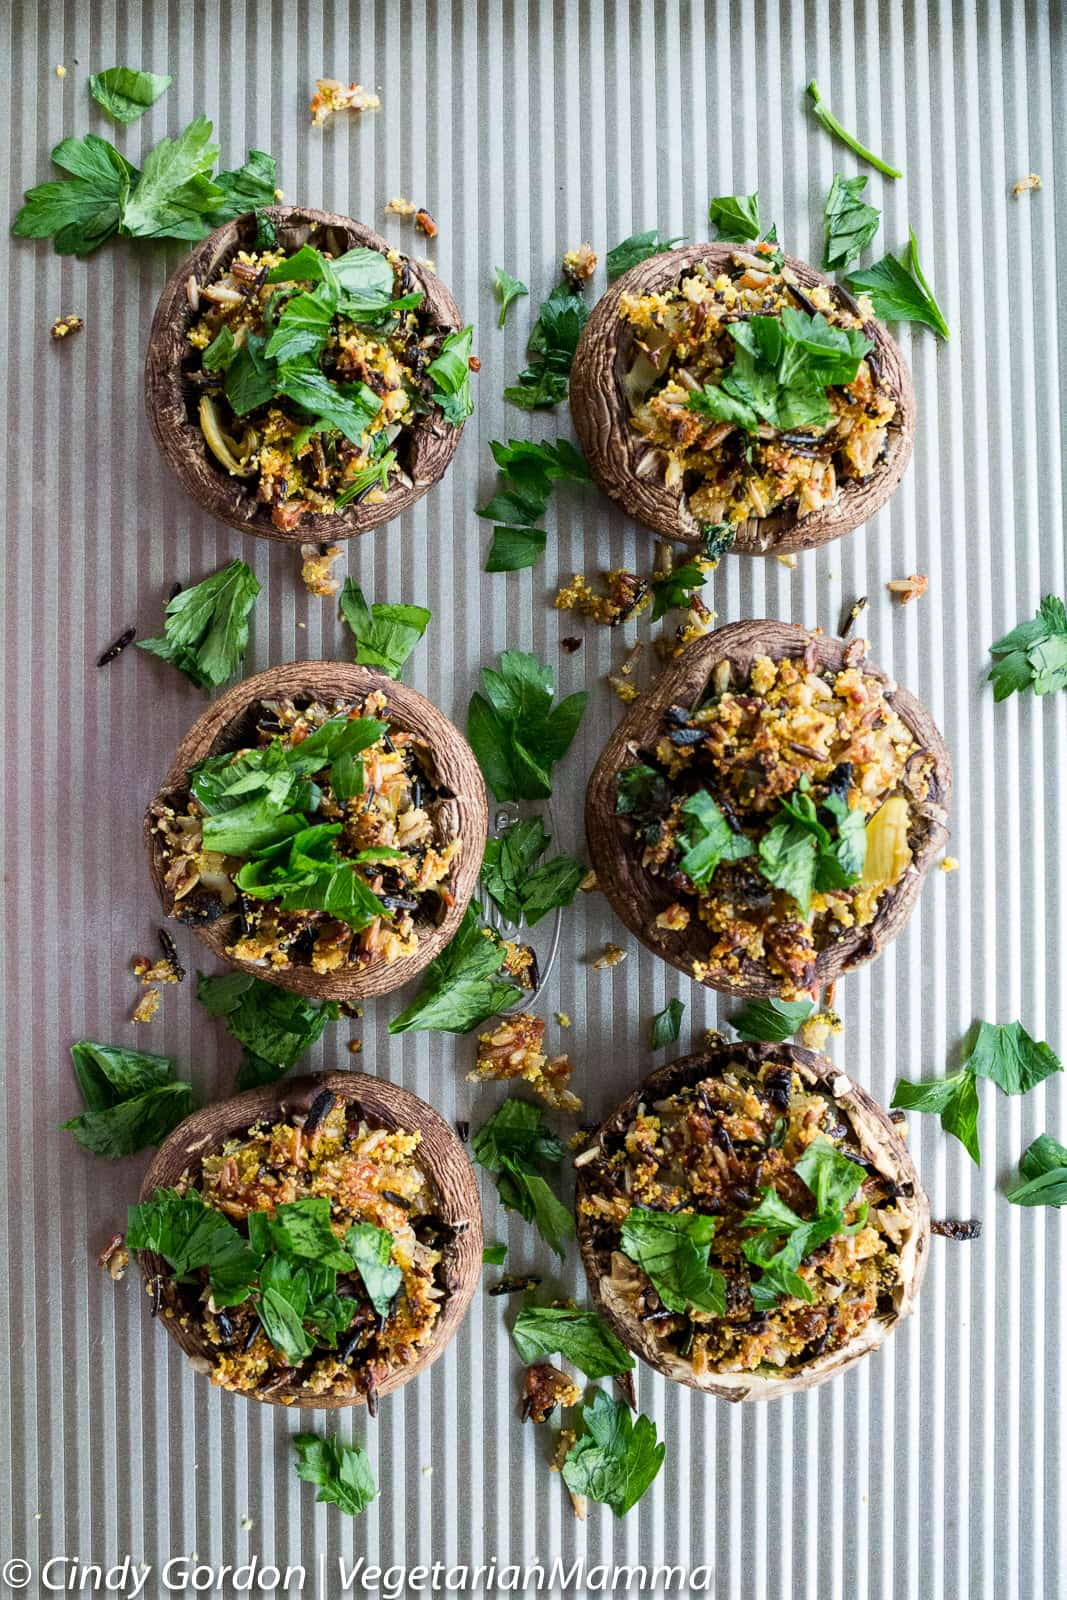 Gluten Free, Vegetarian Wild Rice Stuffed Mushrooms